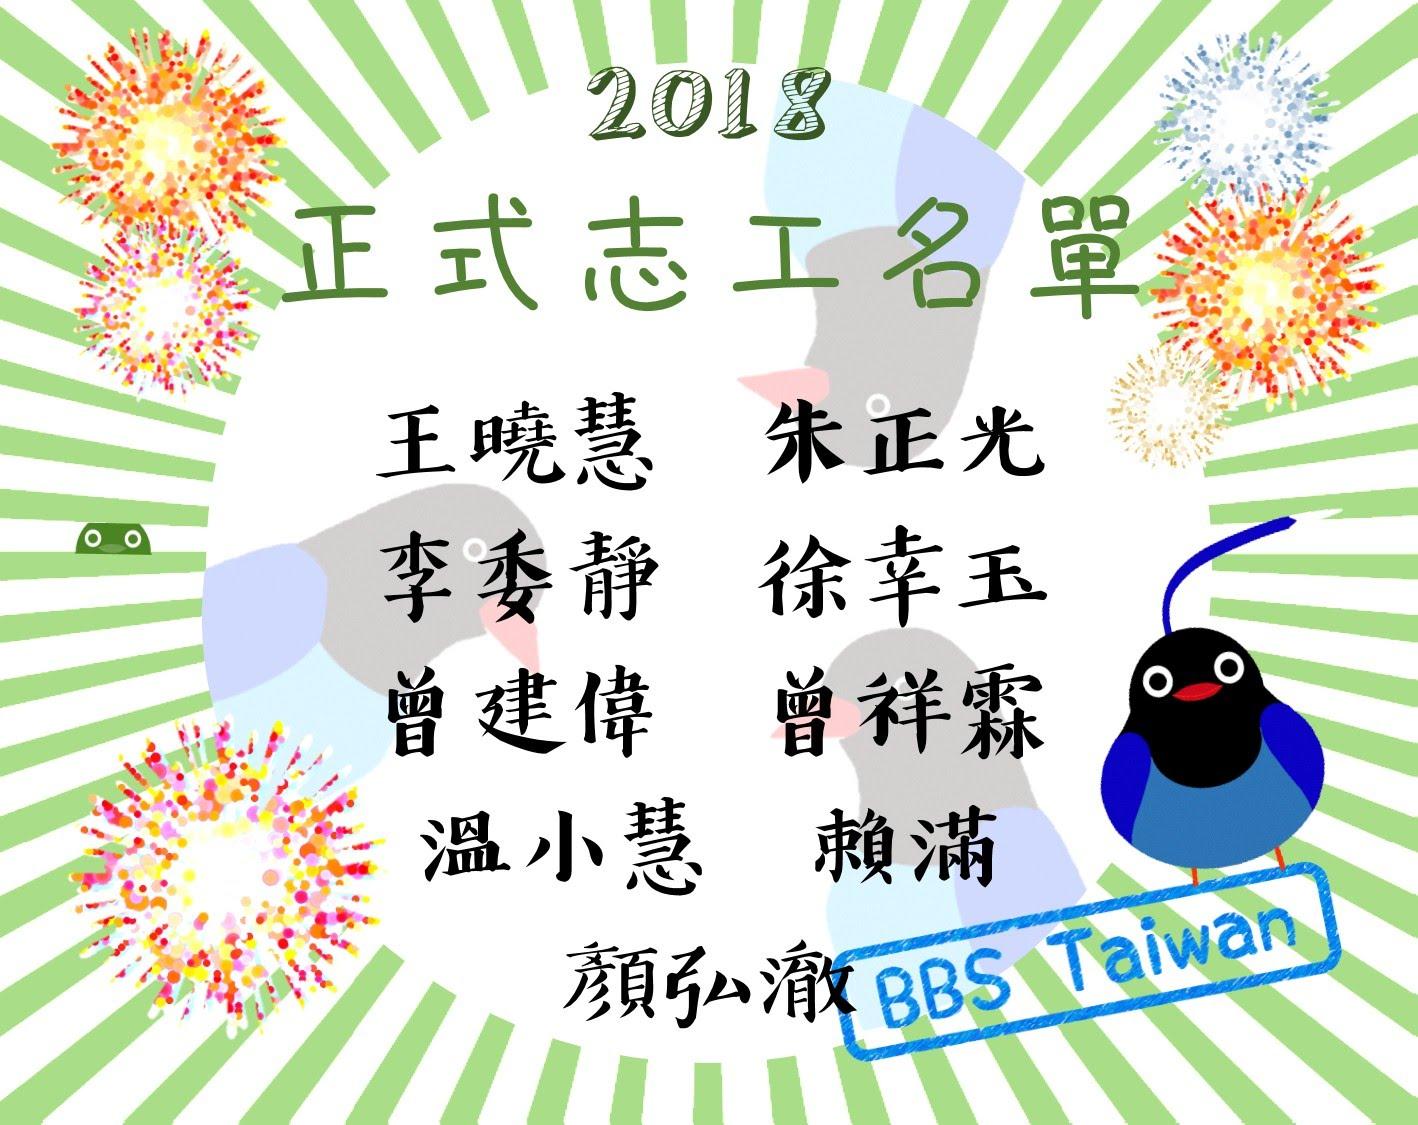 https://sites.google.com/a/birds-tesri.twbbs.org/bbs-taiwan/bbs-taiwan-dian-zi-bao90qi